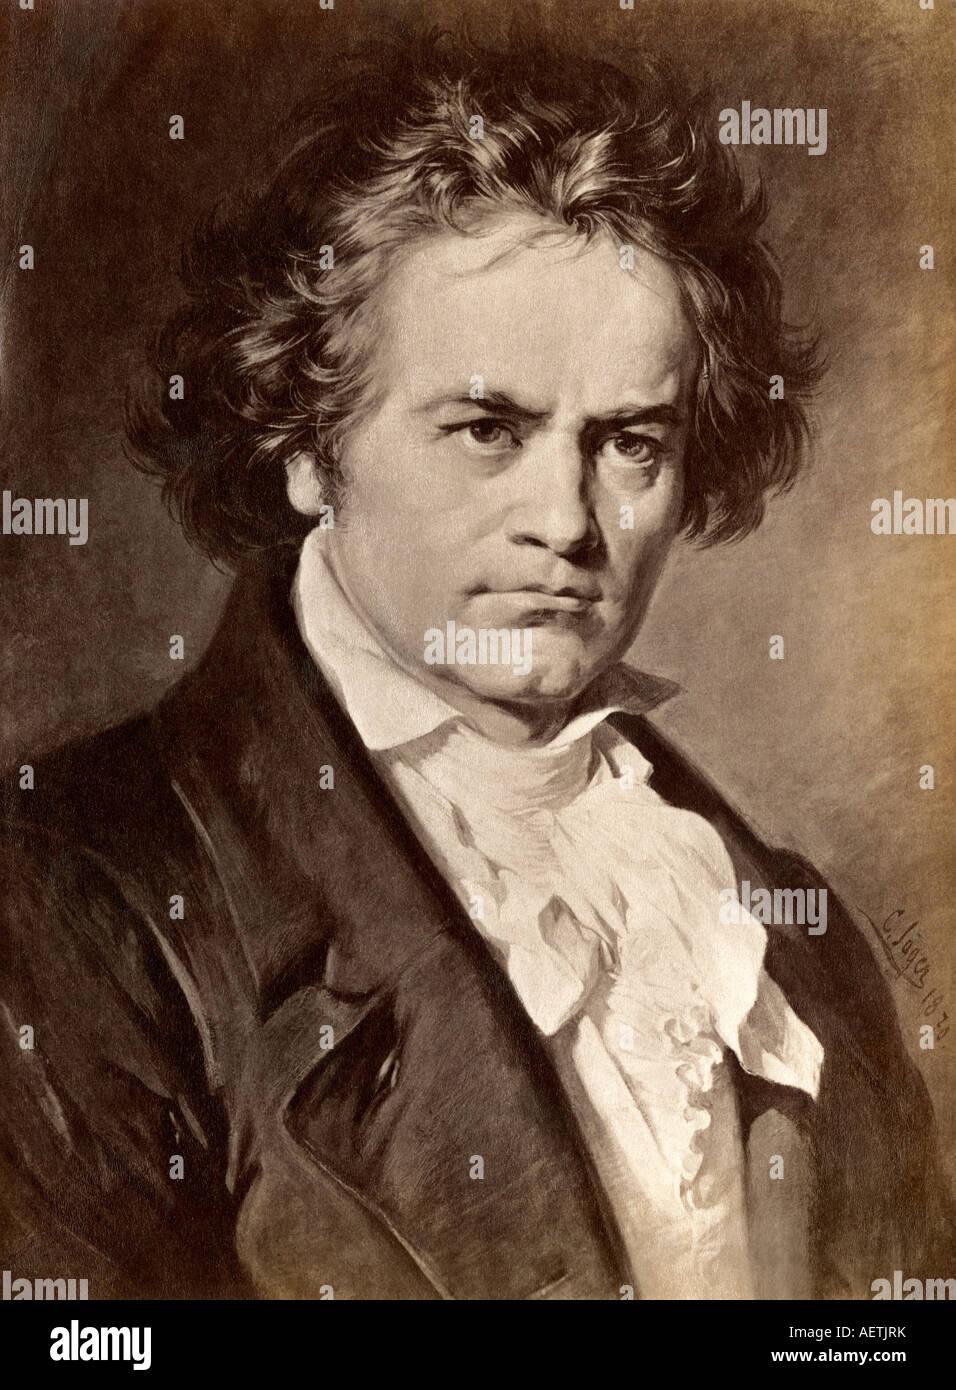 Ludwig van Beethoven. Photograph of an illustration - Stock Image